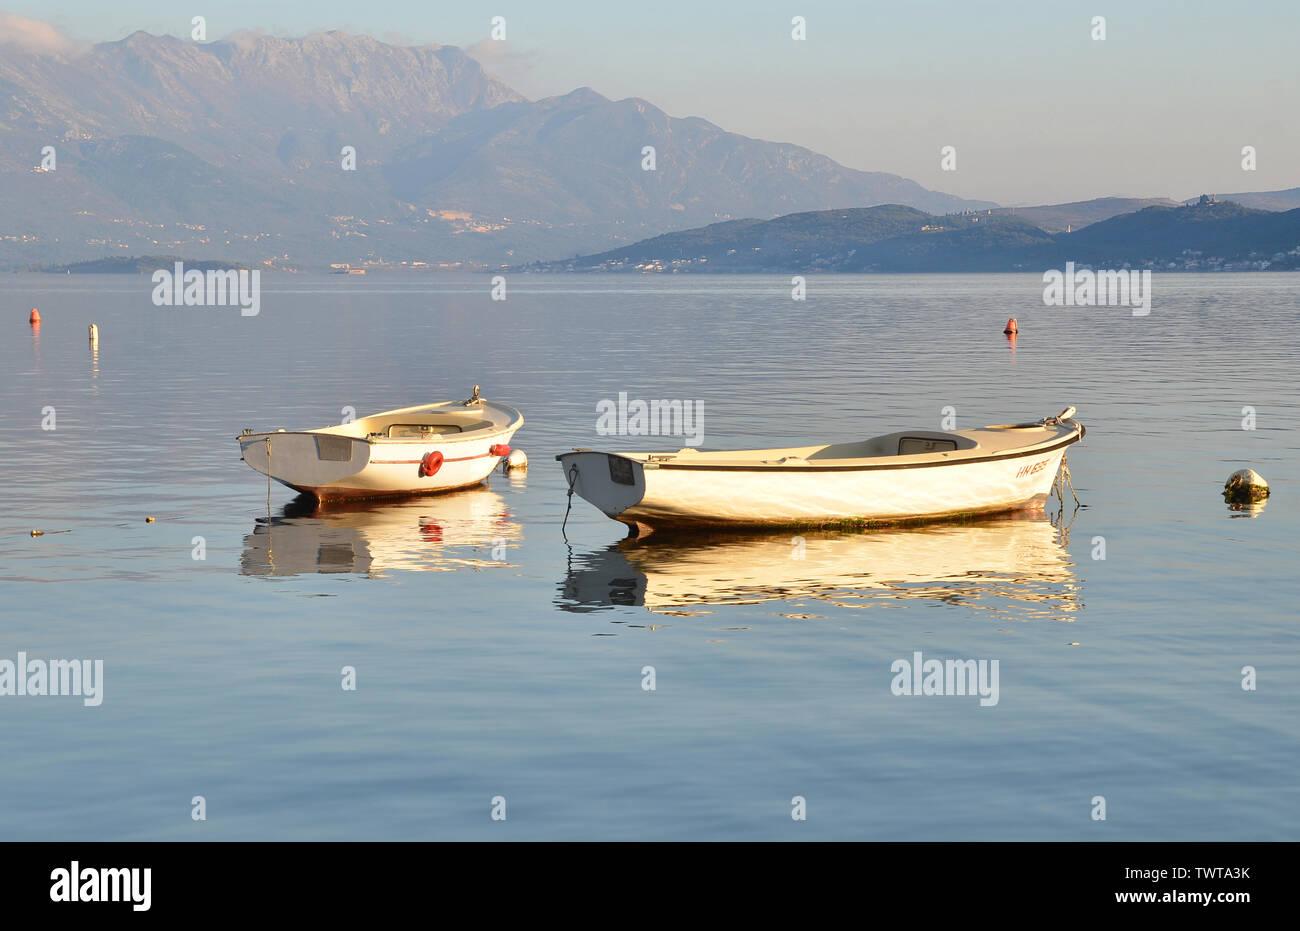 Empty fishermen's boats on Boka Kotorska Bay with Mount Lovcen in the background, Montenegro. Stock Photo